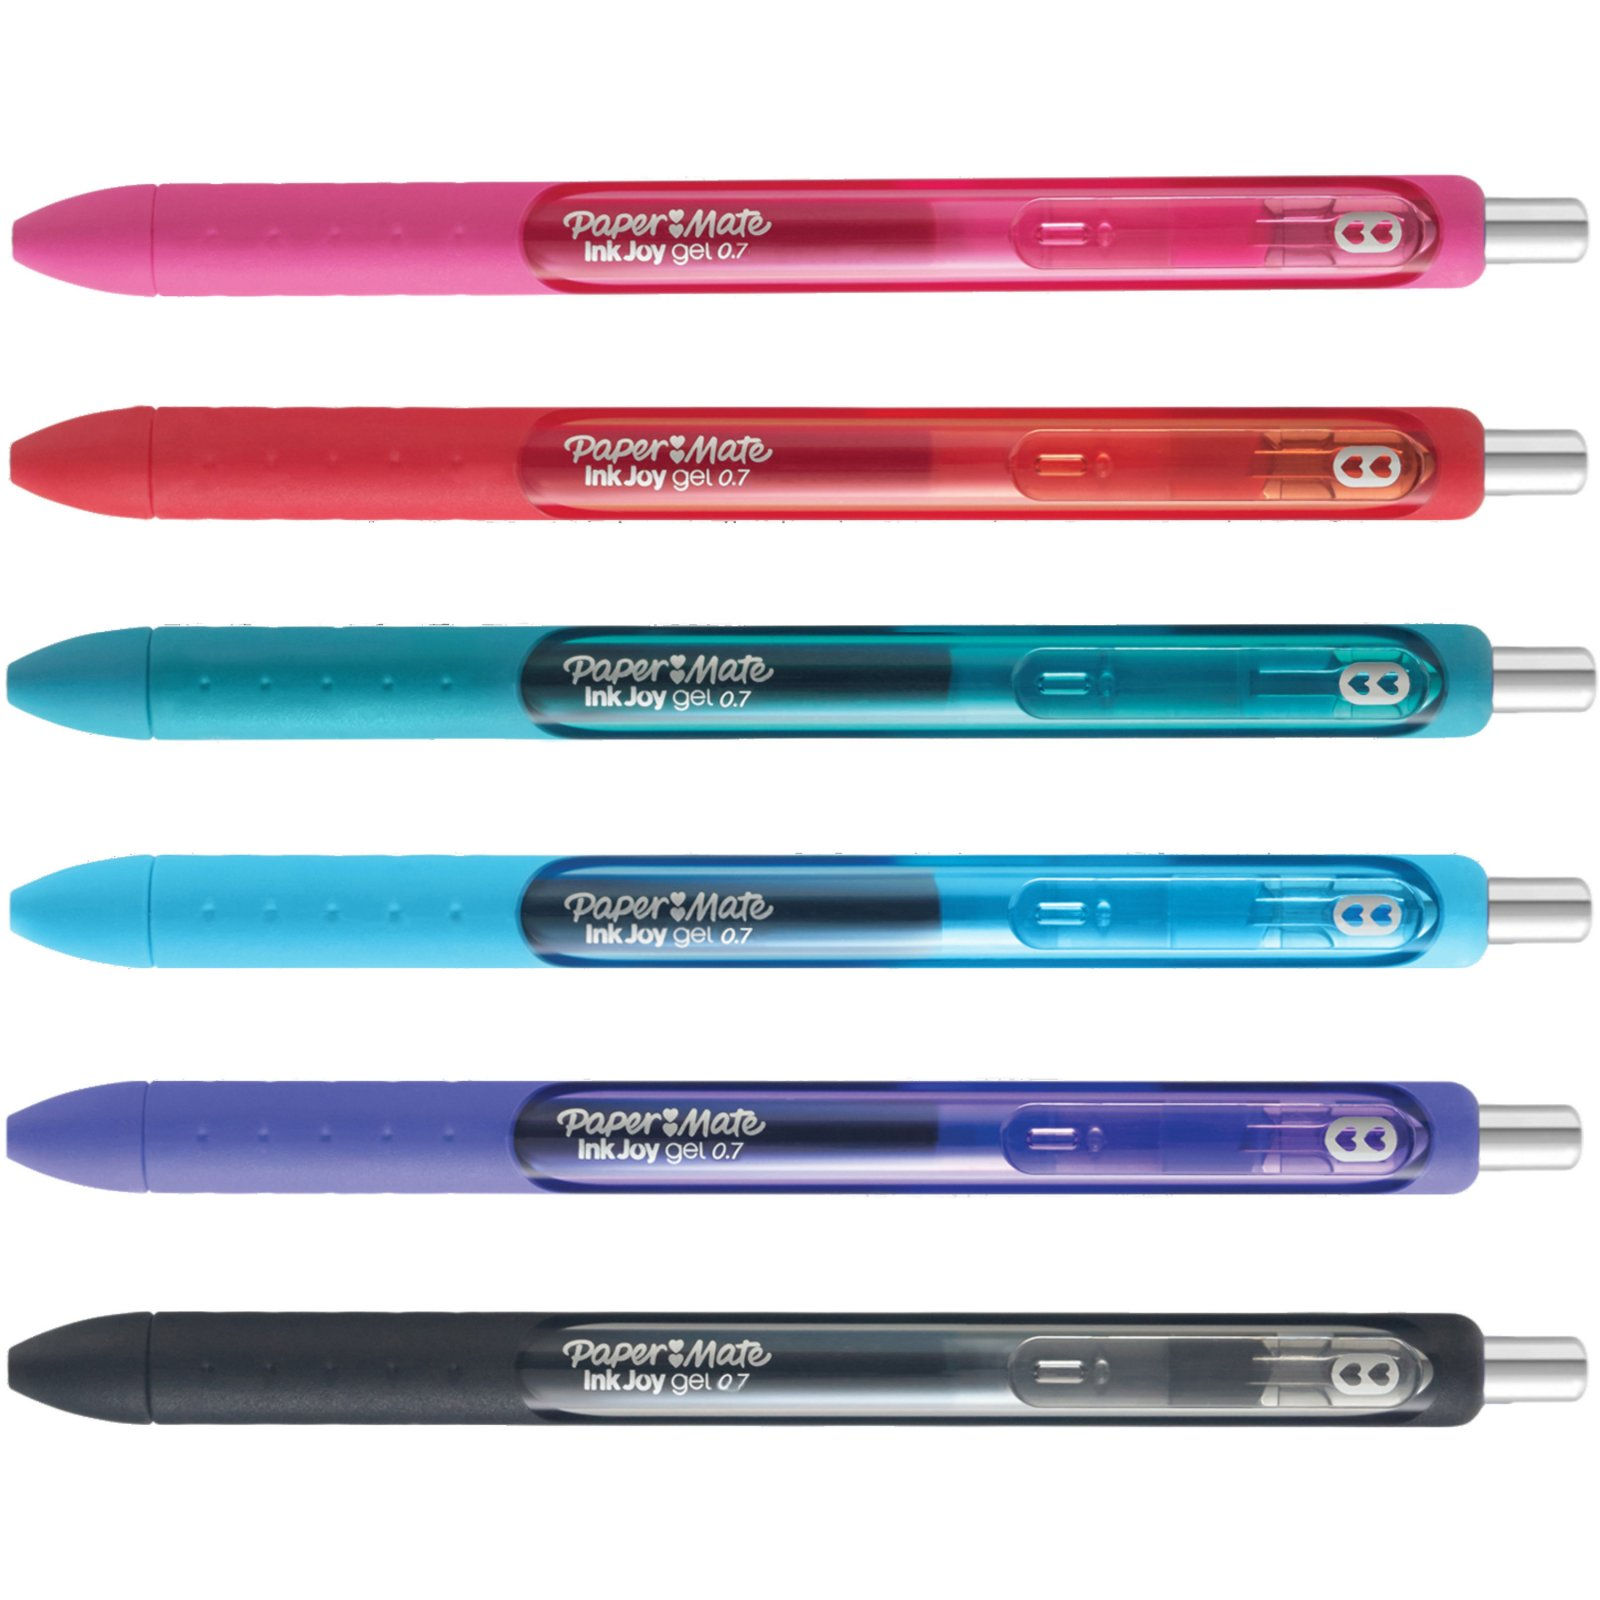 Inkjoy Gel Pens